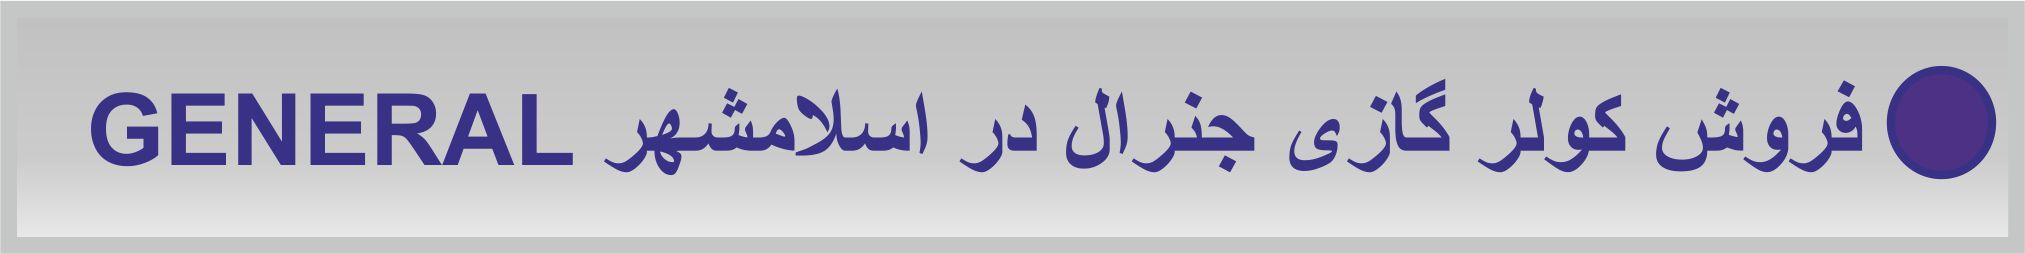 فروش کولر گازی جنرال در اسلامشهر